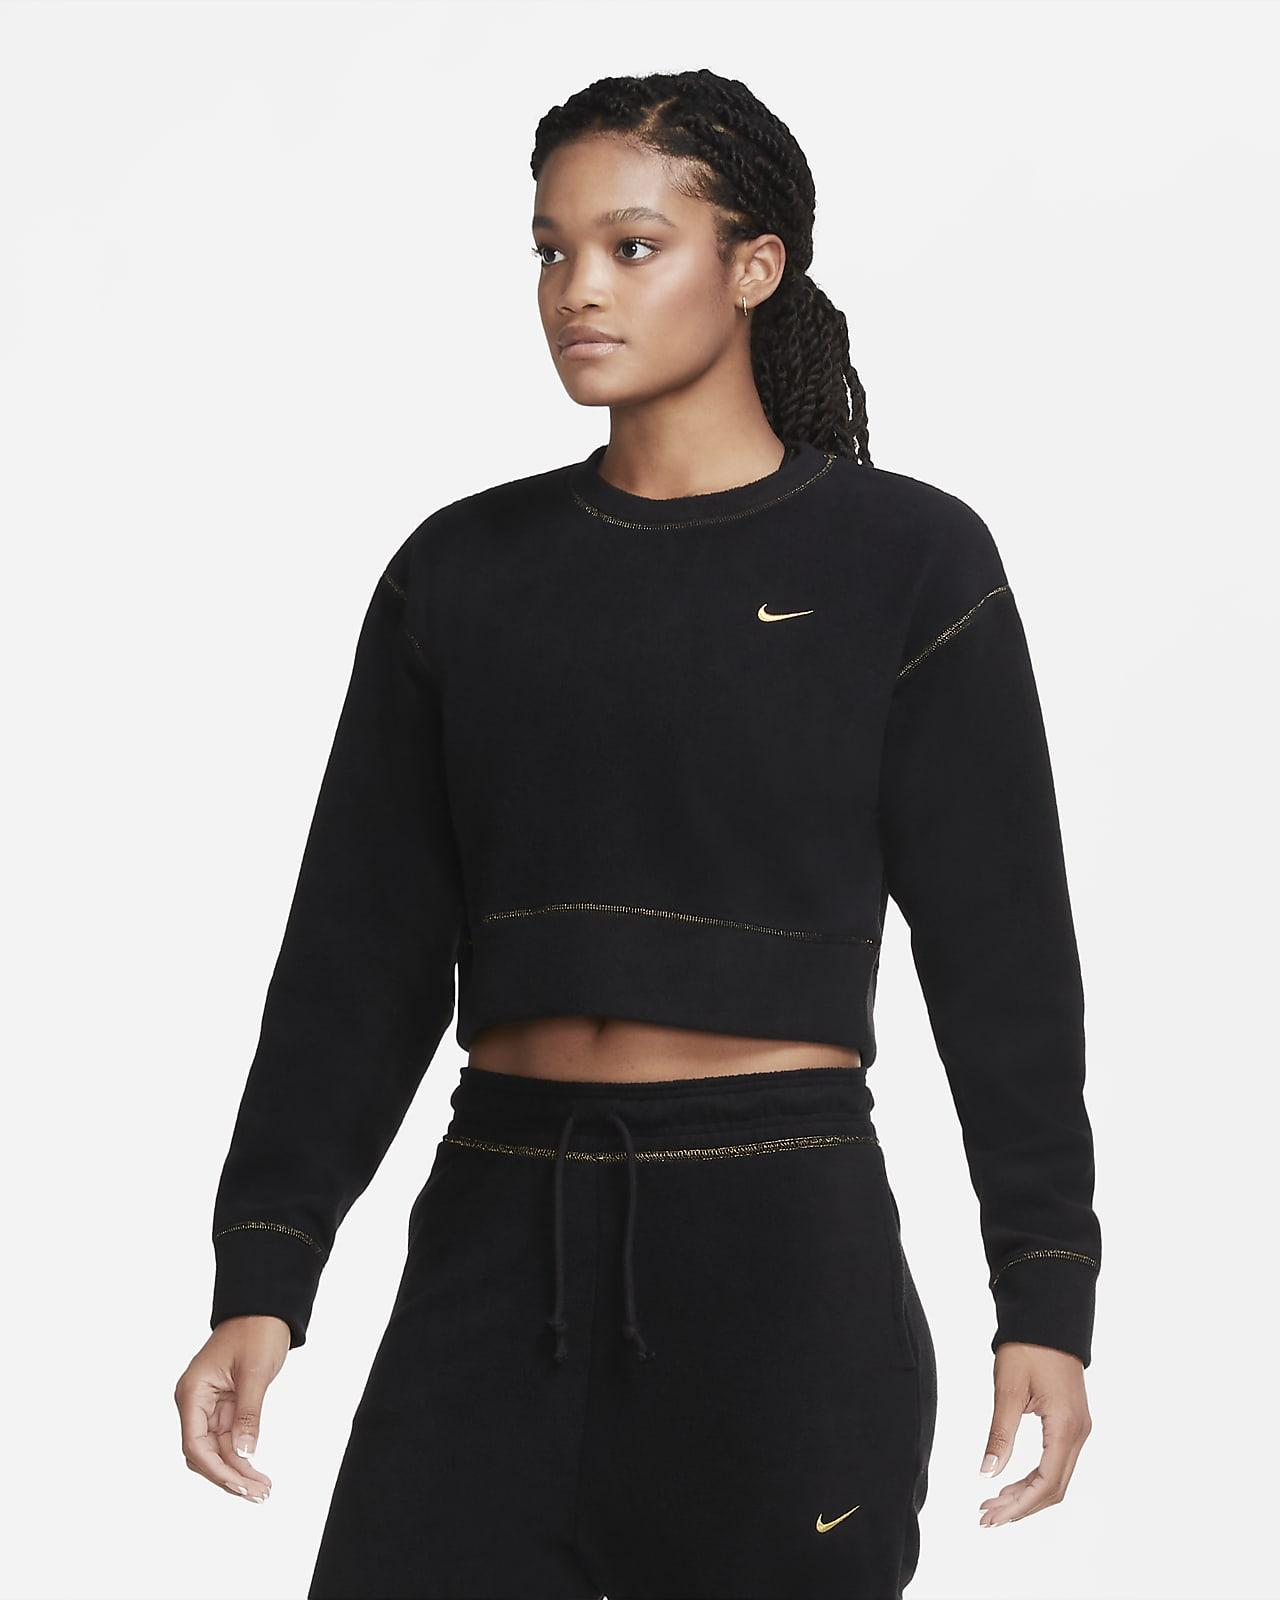 Camisola de treino de manga comprida de lã cardada Nike Therma Icon Clash para mulher